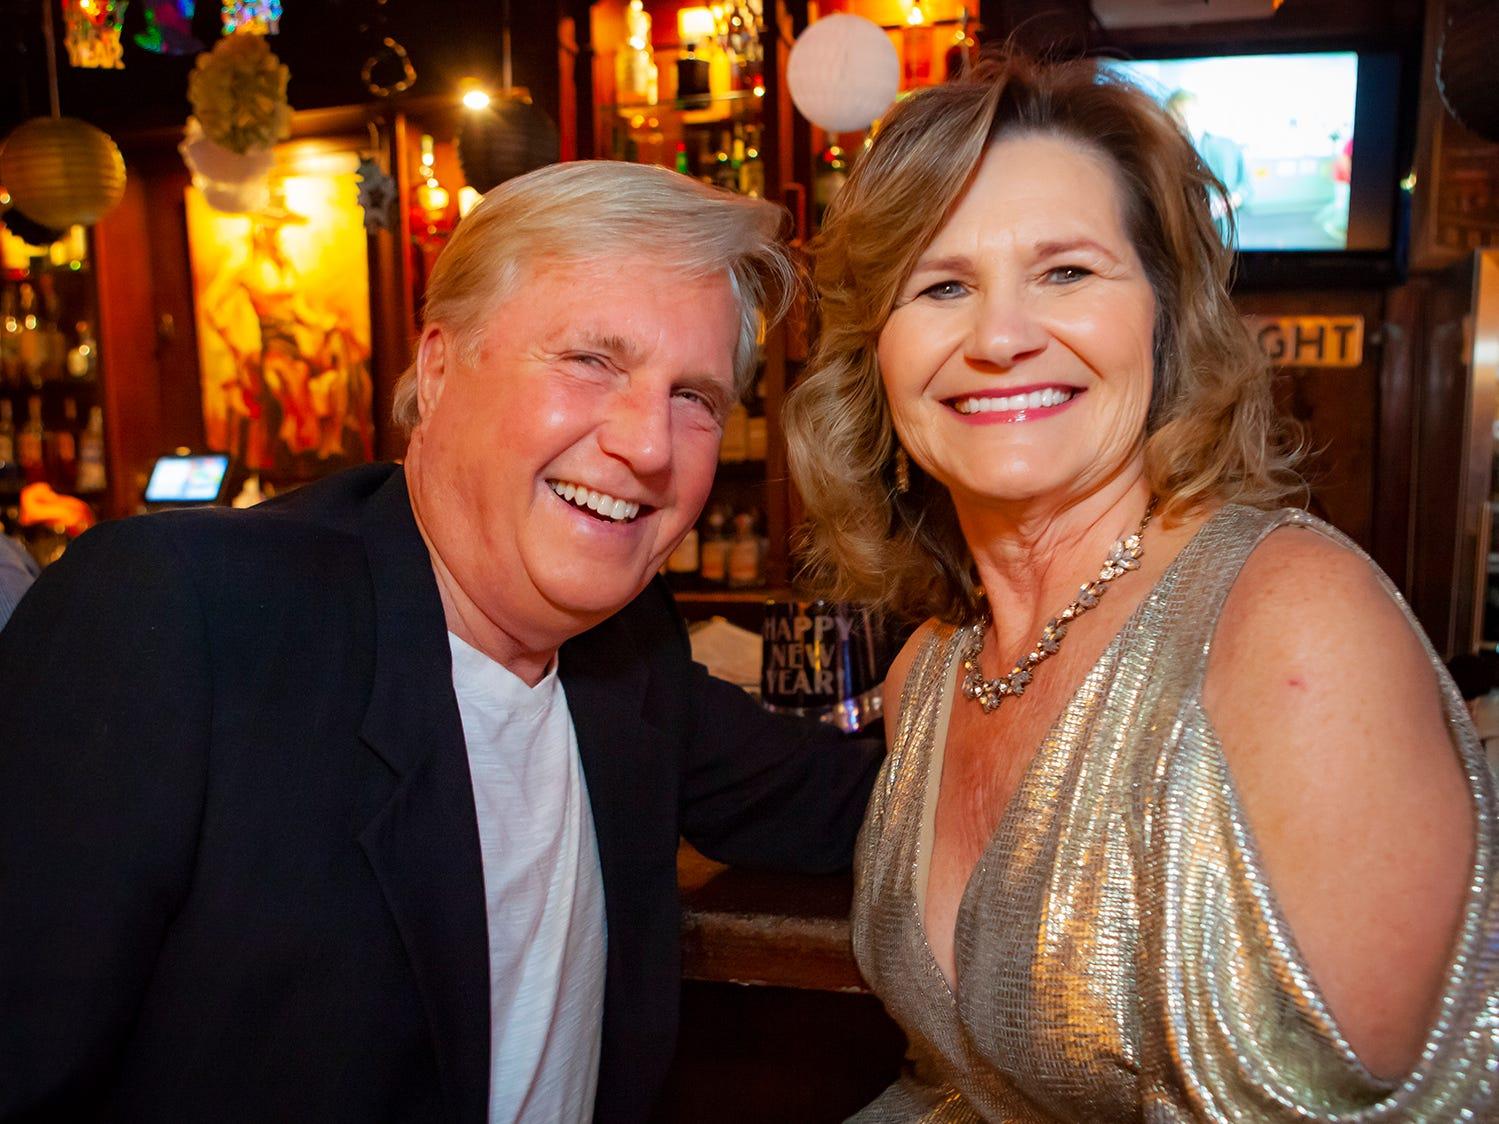 John Carlton and Lynn Pater at the New Year's party at Hank's Honky Tonk in Murfreesboro.